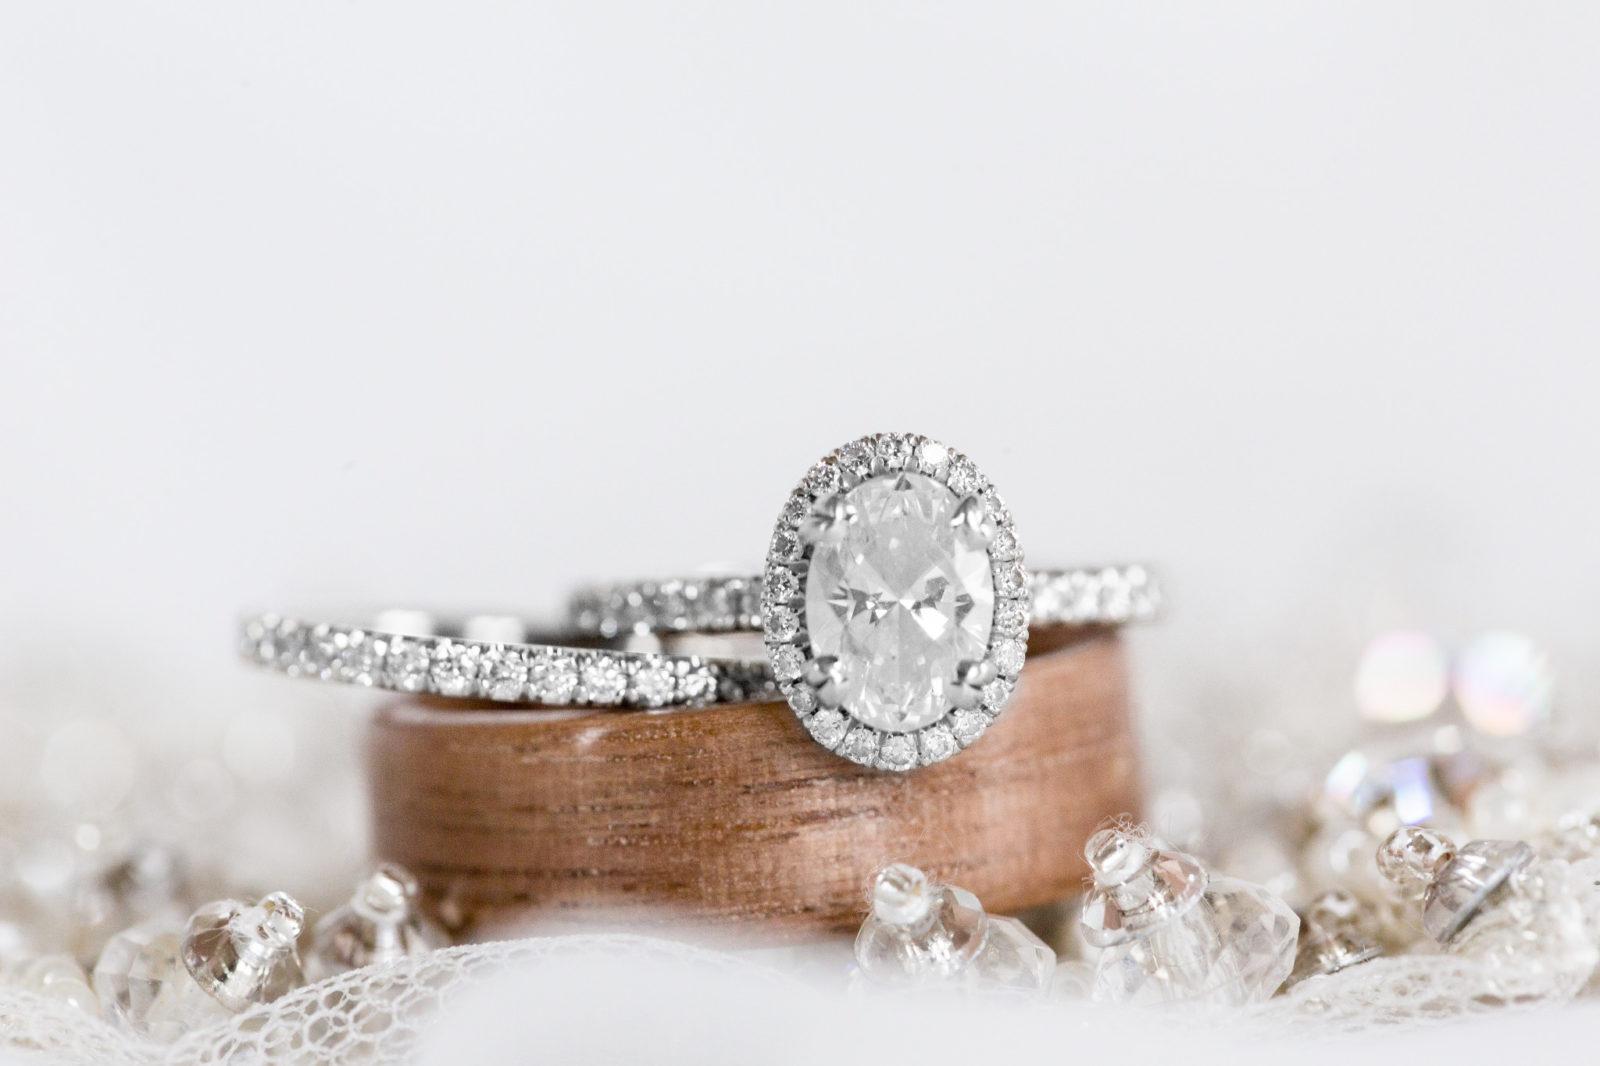 Kohl-Mansion-Wedding-Photographer-Palo-Altop-Wedding-3-of-13-e1459489347888-1600x1066.jpg